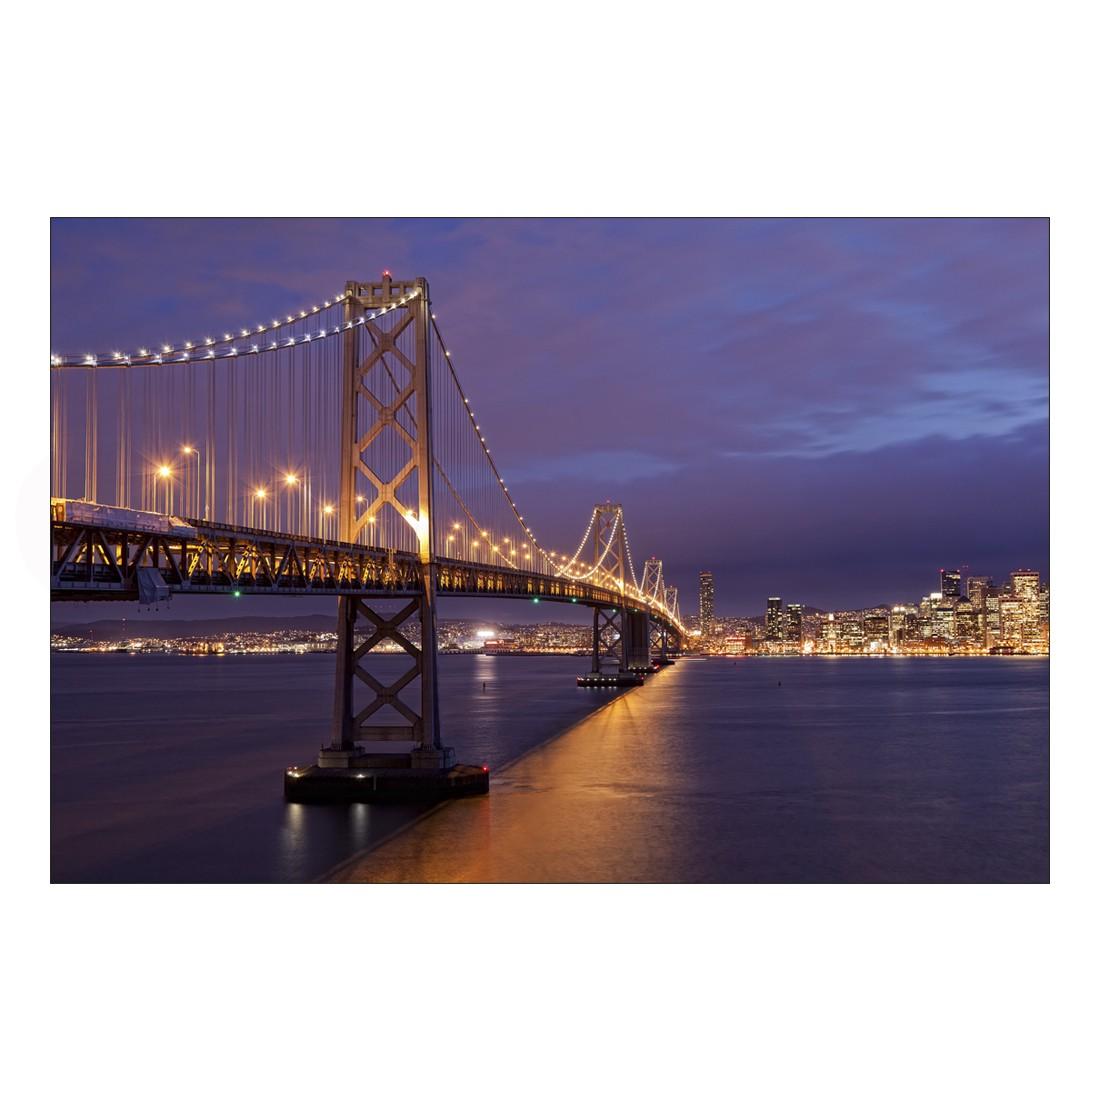 Acrylglasbild Bridge by Night – Abmessung 60×40 cm, Gallery of Innovative Art online kaufen